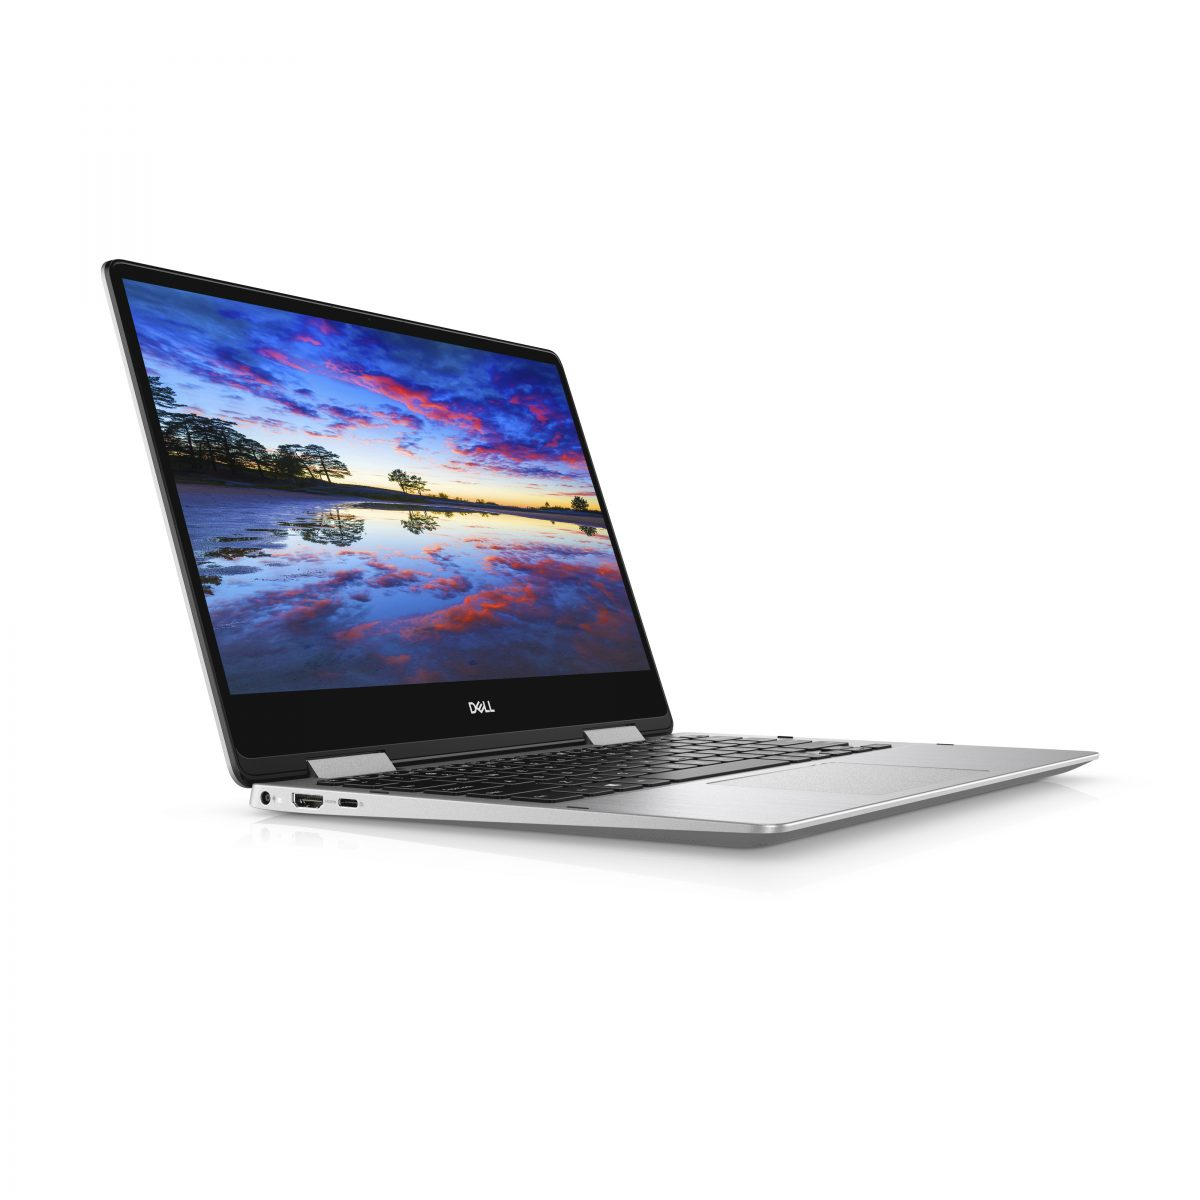 25679-laptop-inspiron-13-7386-t-rf-gy-4000×4000